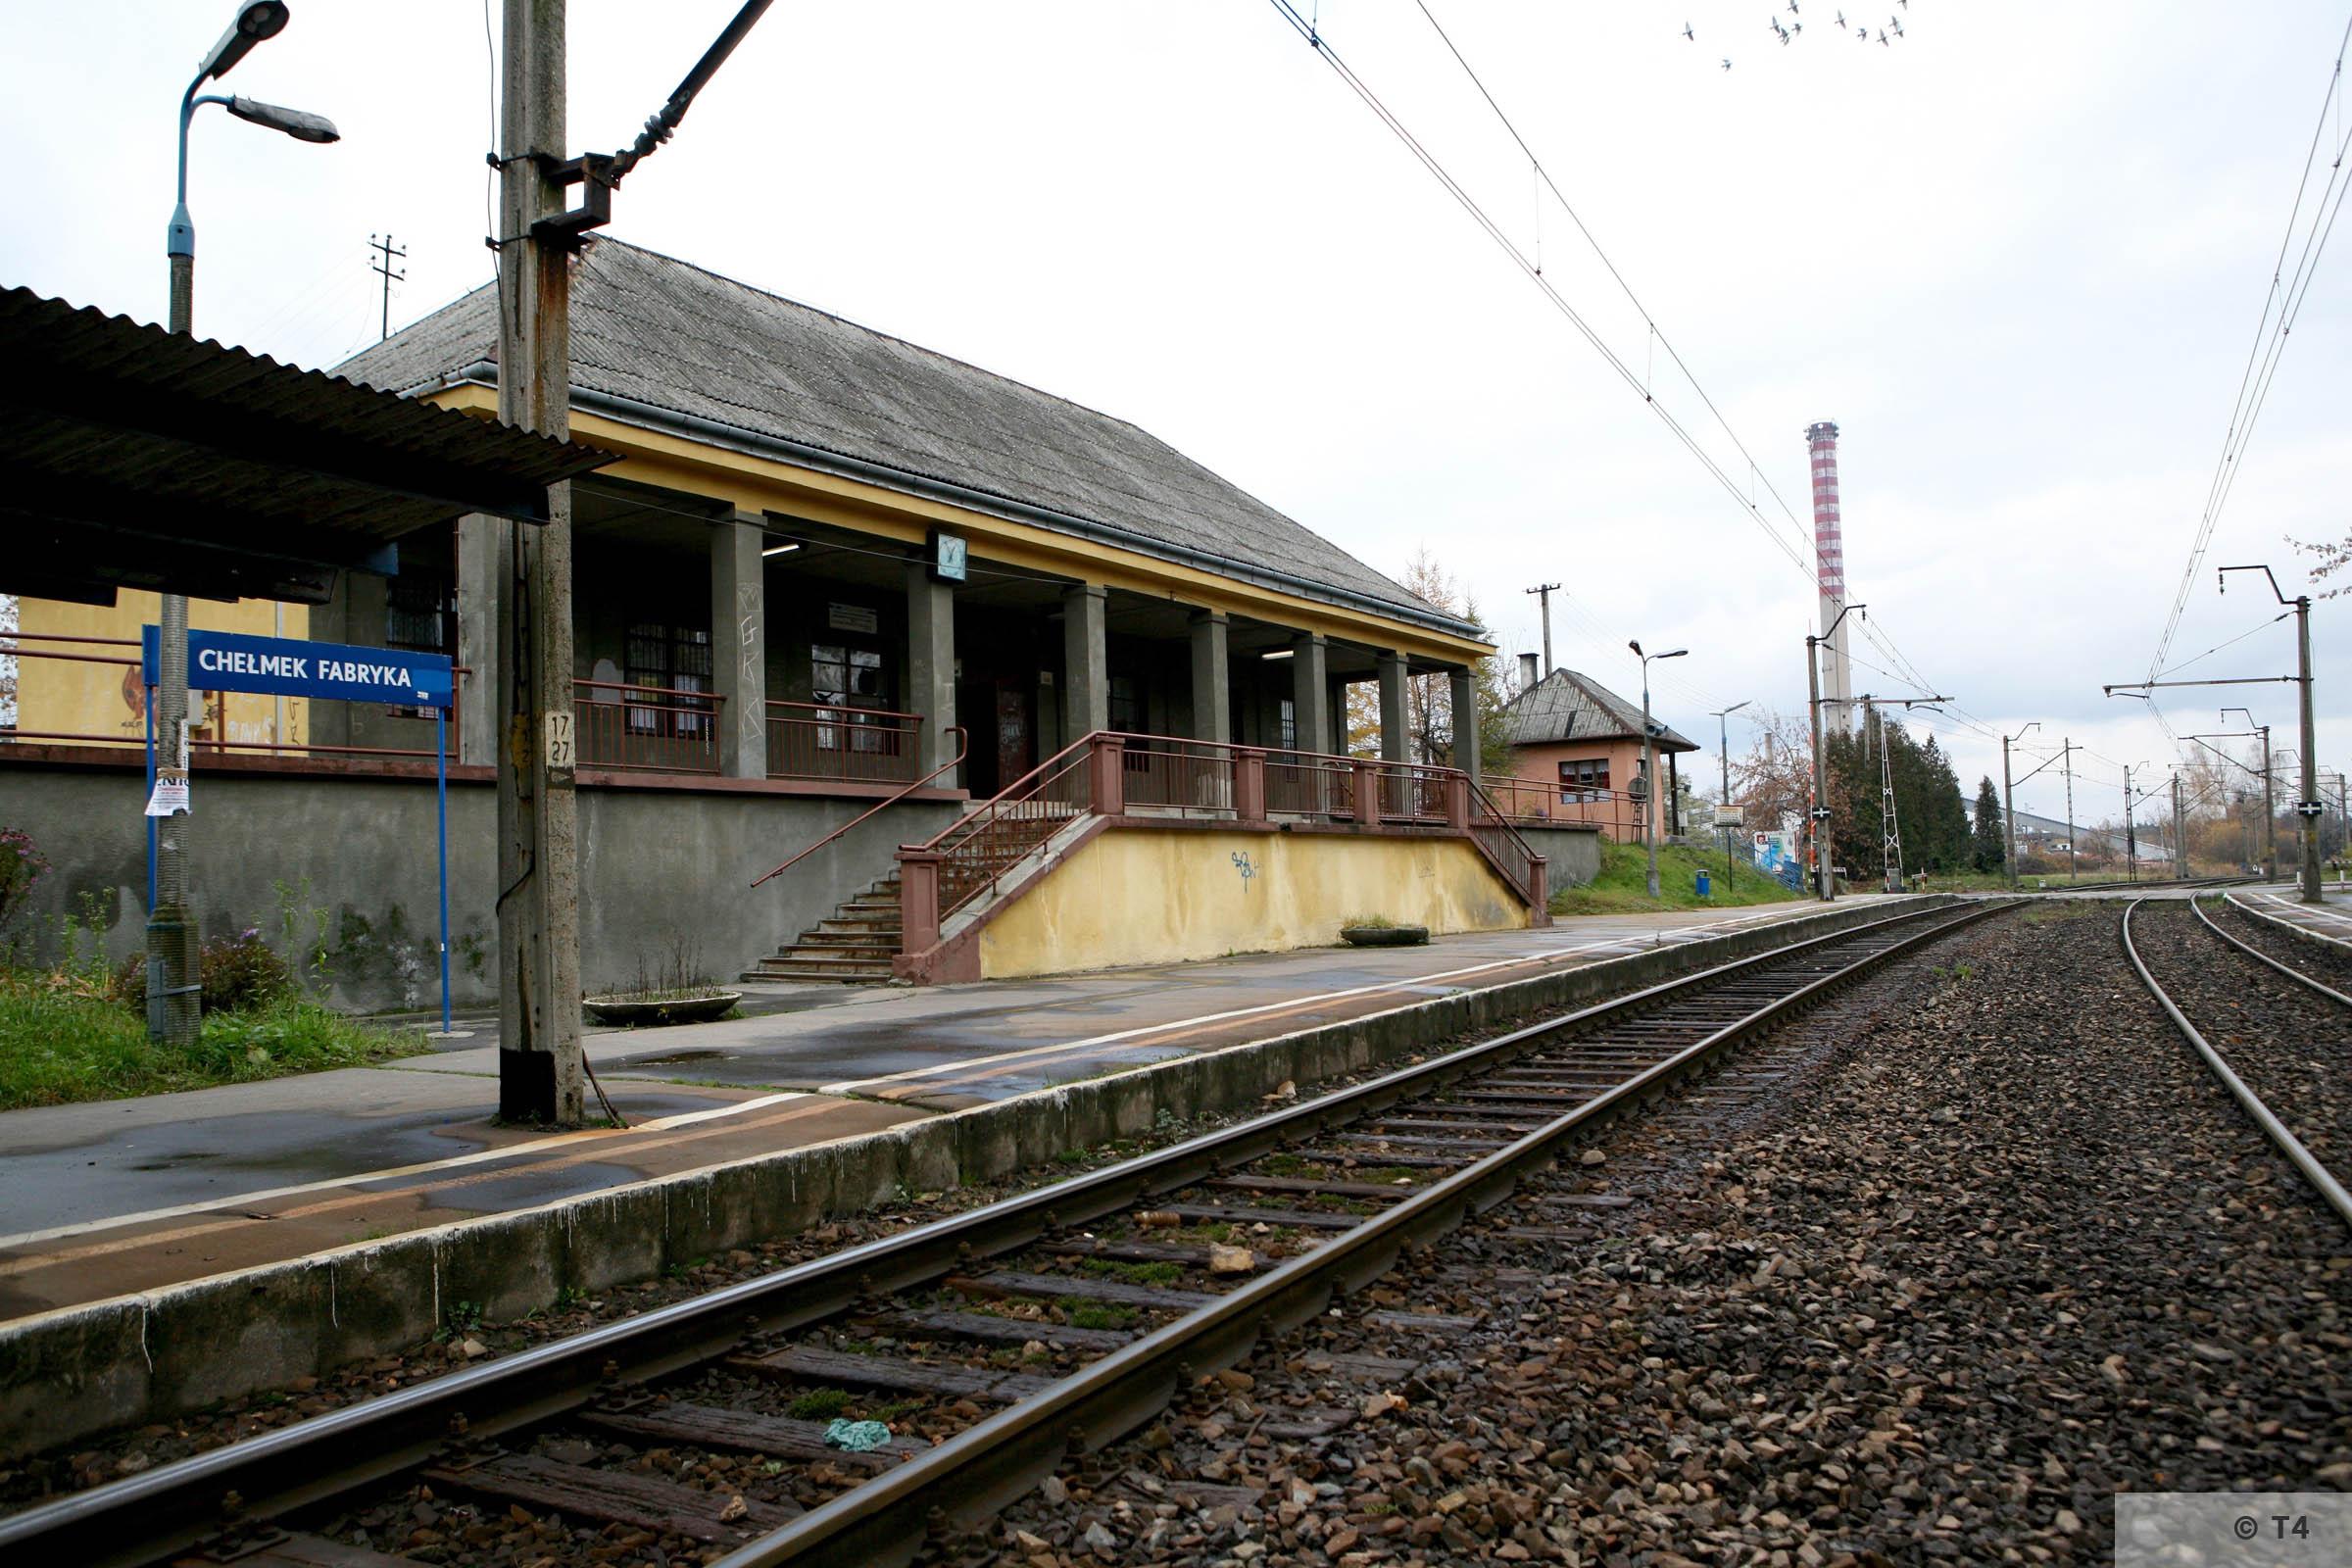 Chelmek Fabryka railway station. 2007 T4 3346